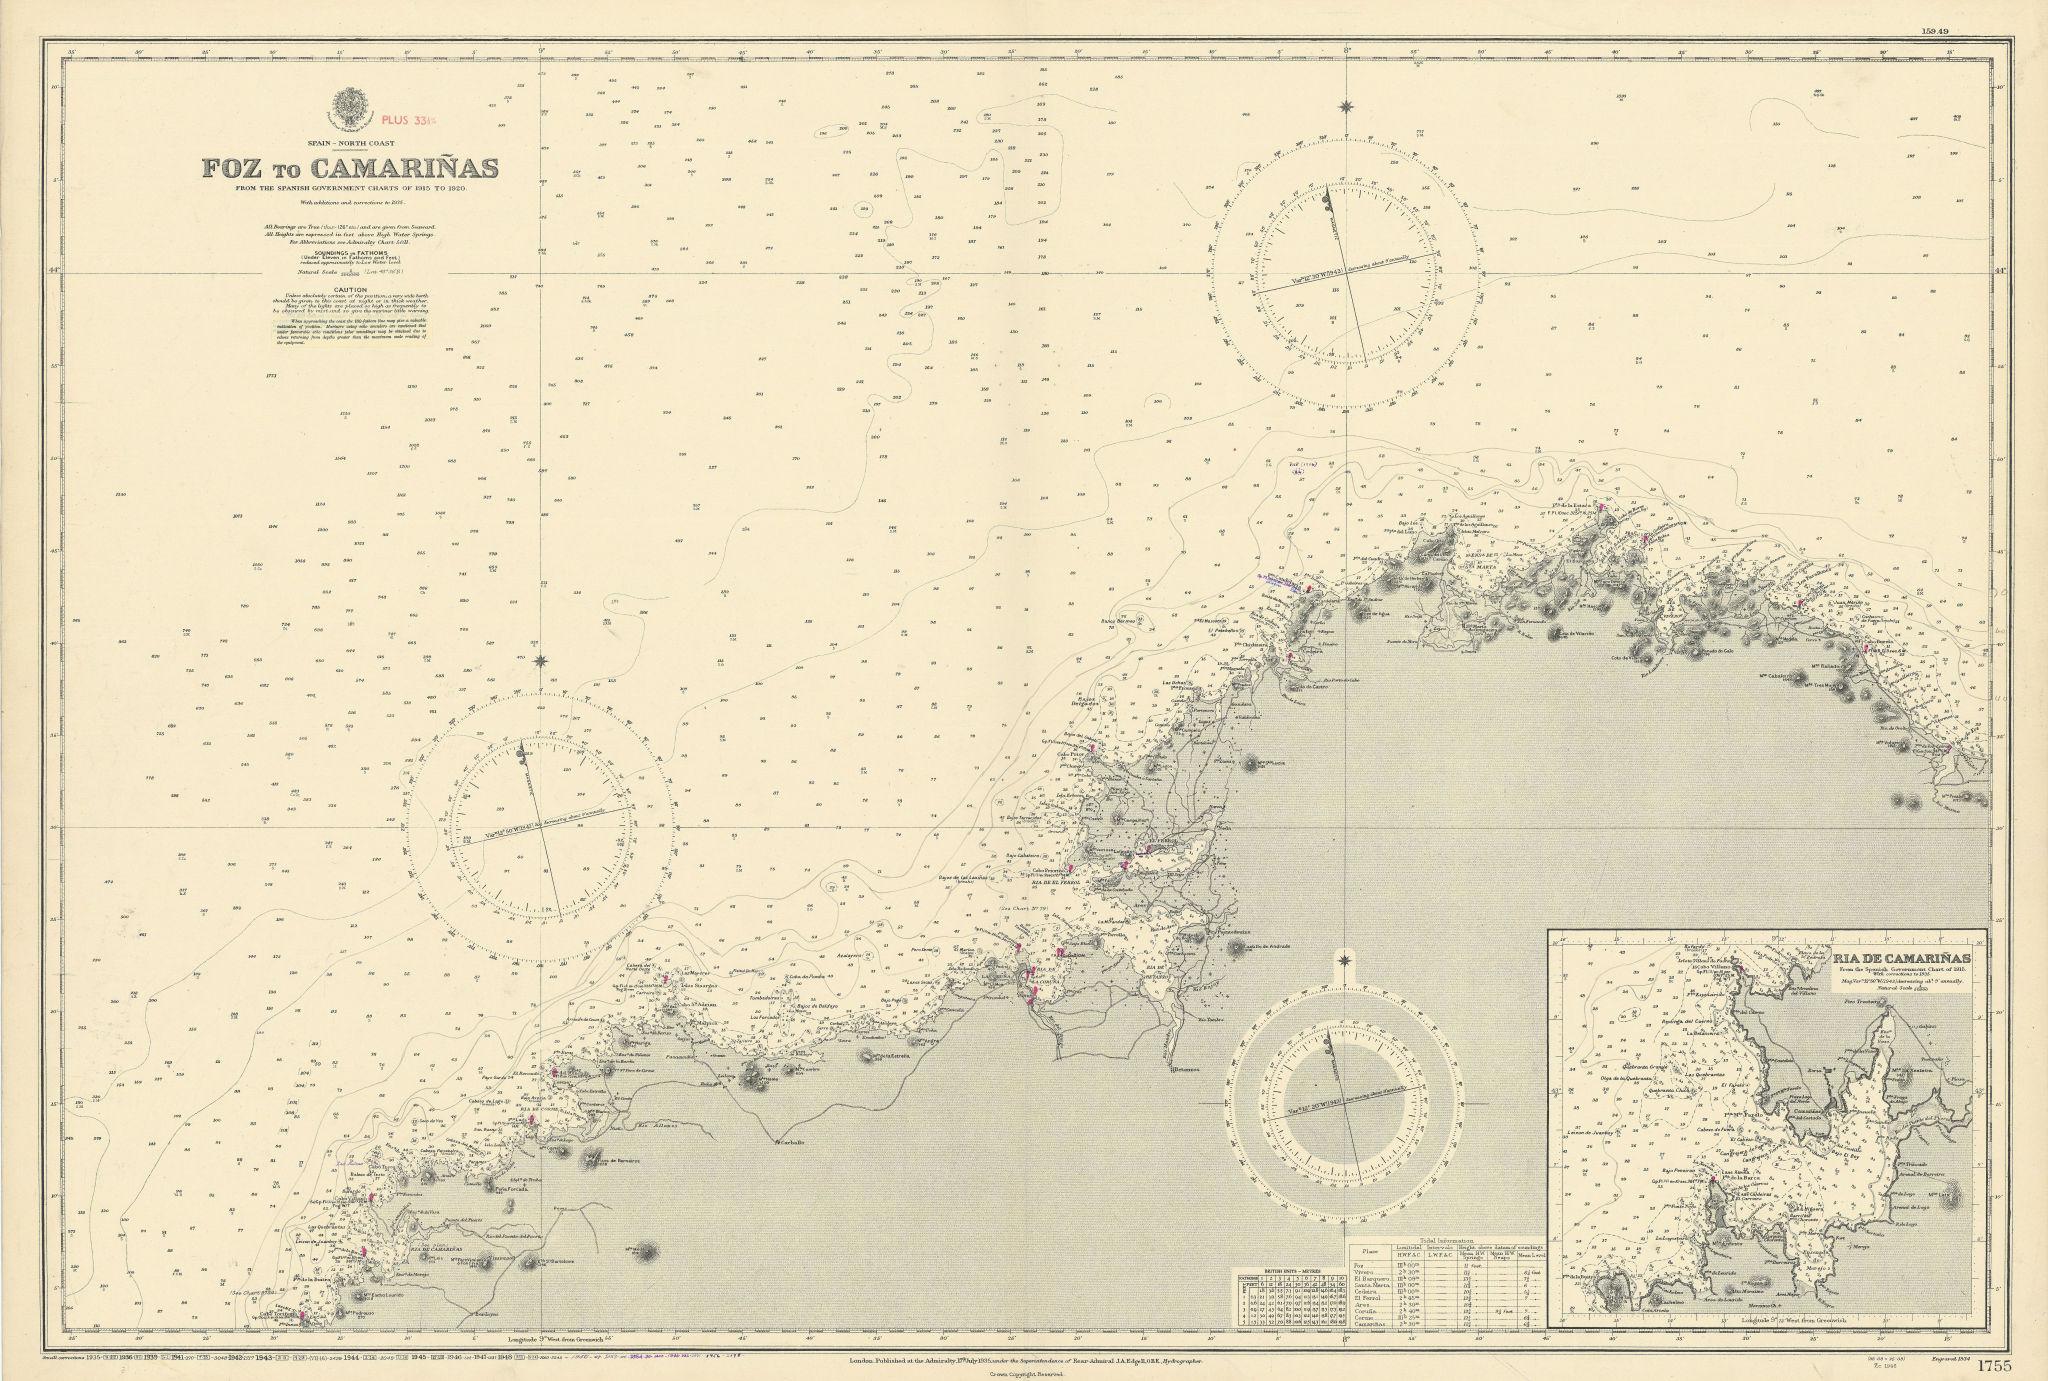 Galicia Spain coast. Foz-Camariñas La Coruña ADMIRALTY sea chart 1935 (1956) map